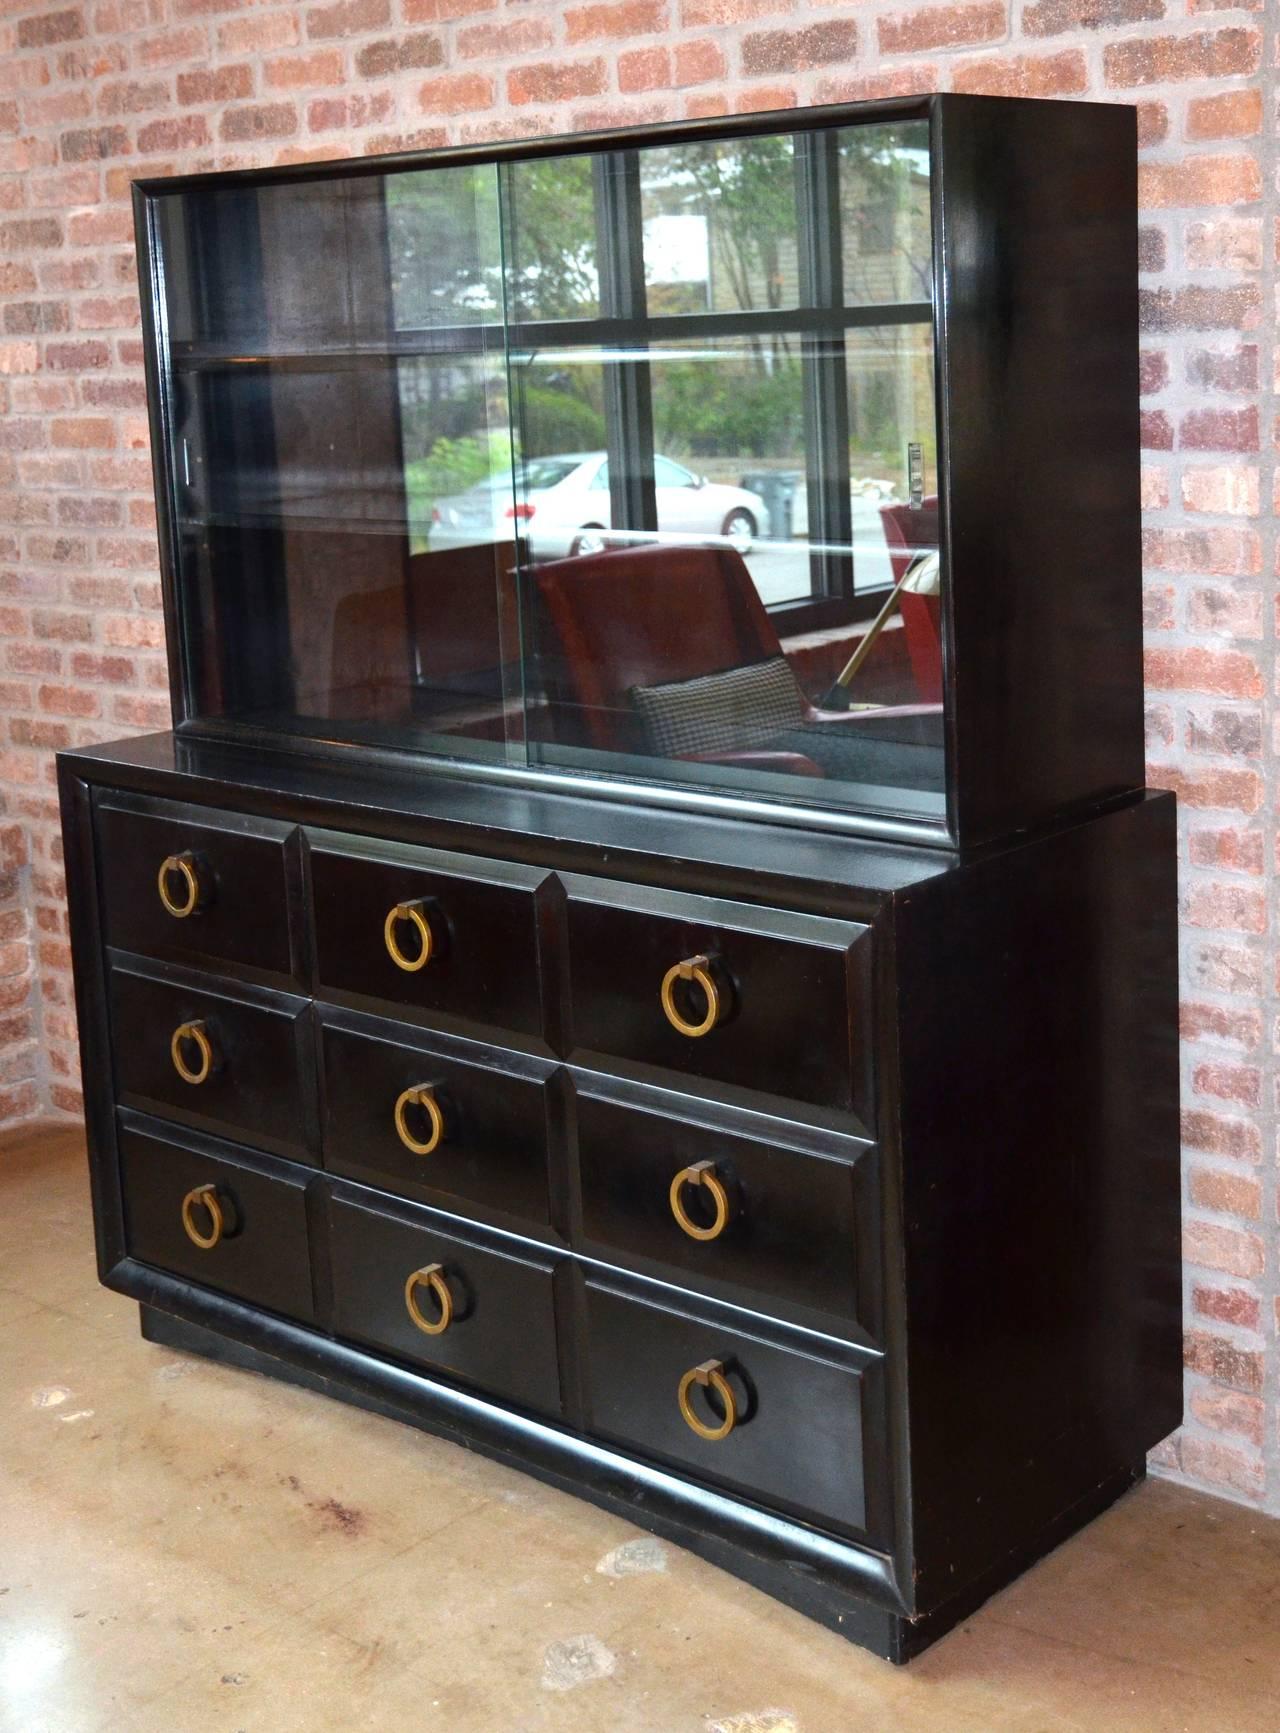 American Mid-Century Dresser or Media Cabinet by T. H. Robsjohn-Gibbings for Widdicomb For Sale